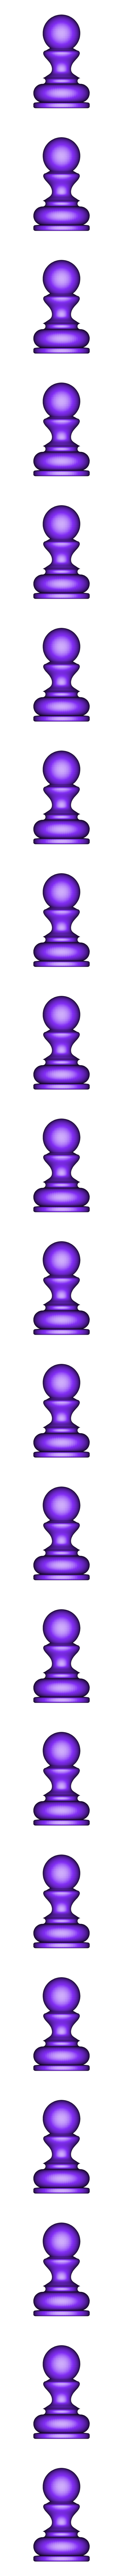 Pawn.STL Download free STL file Chess set / Chess set • 3D printable model, OC3D